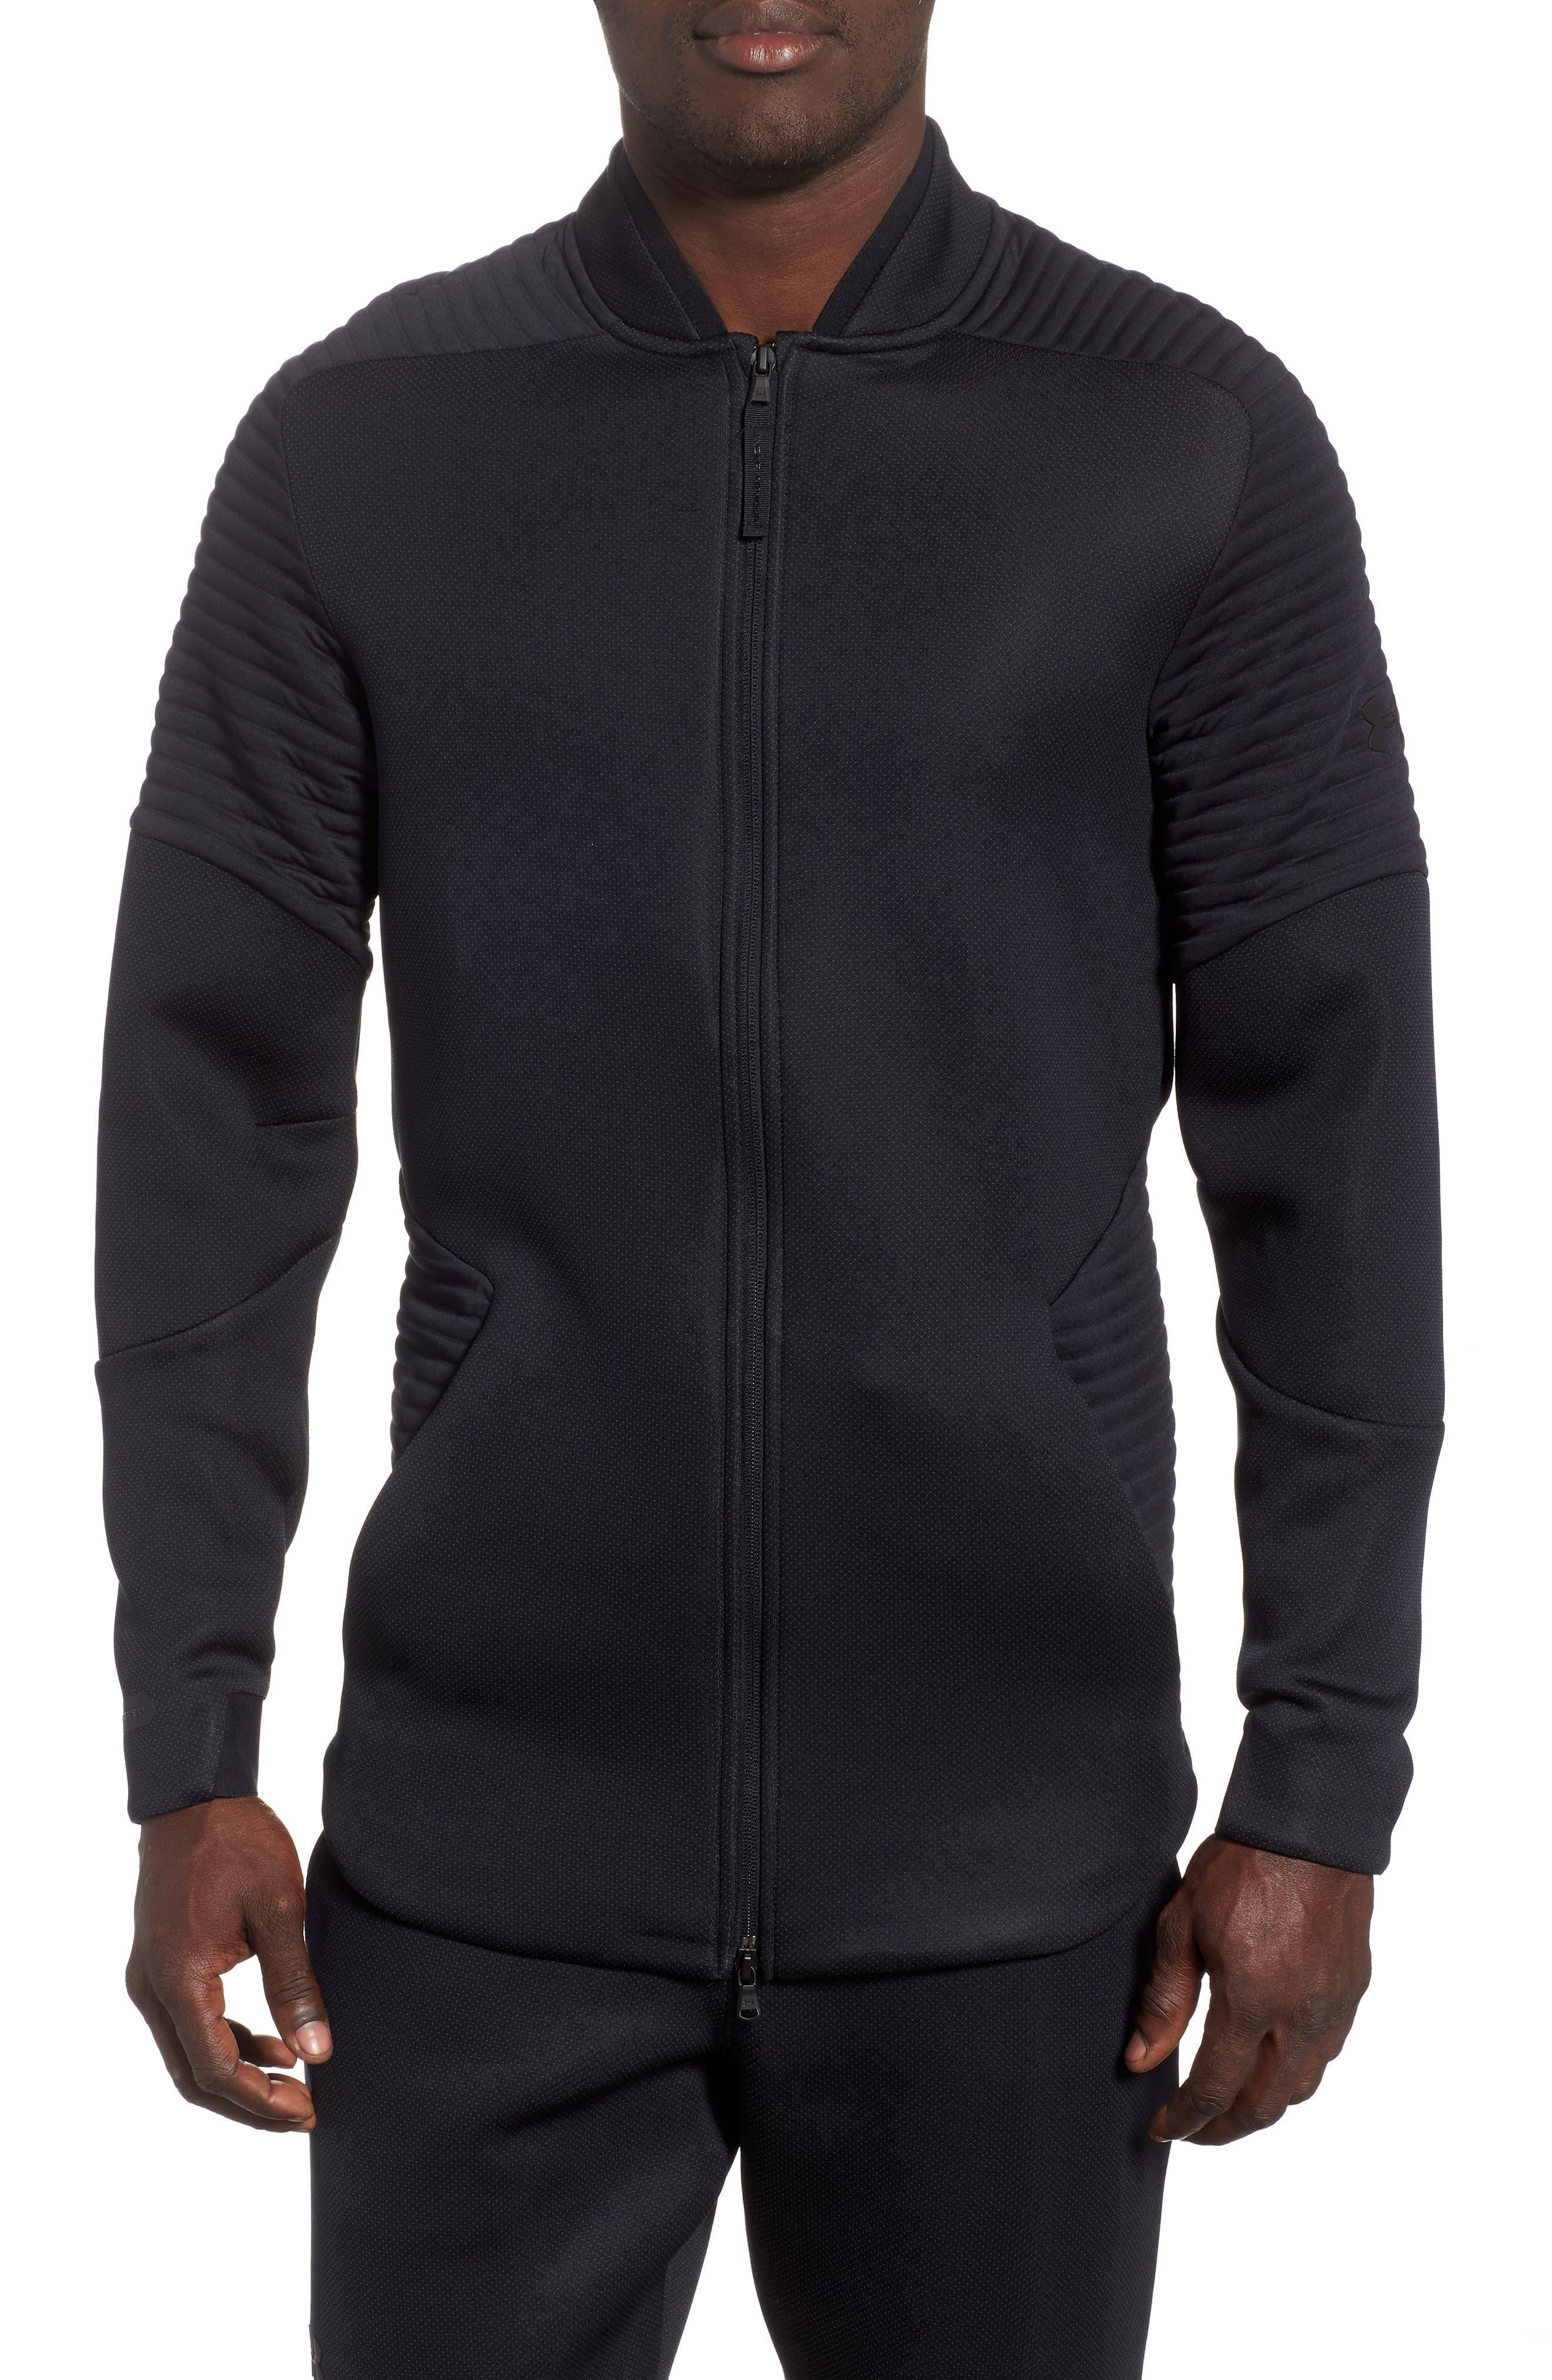 Unstoppable /MOVE Jacket,                             Main thumbnail 1, color,                             BLACK/ CHARCOAL/ BLACK